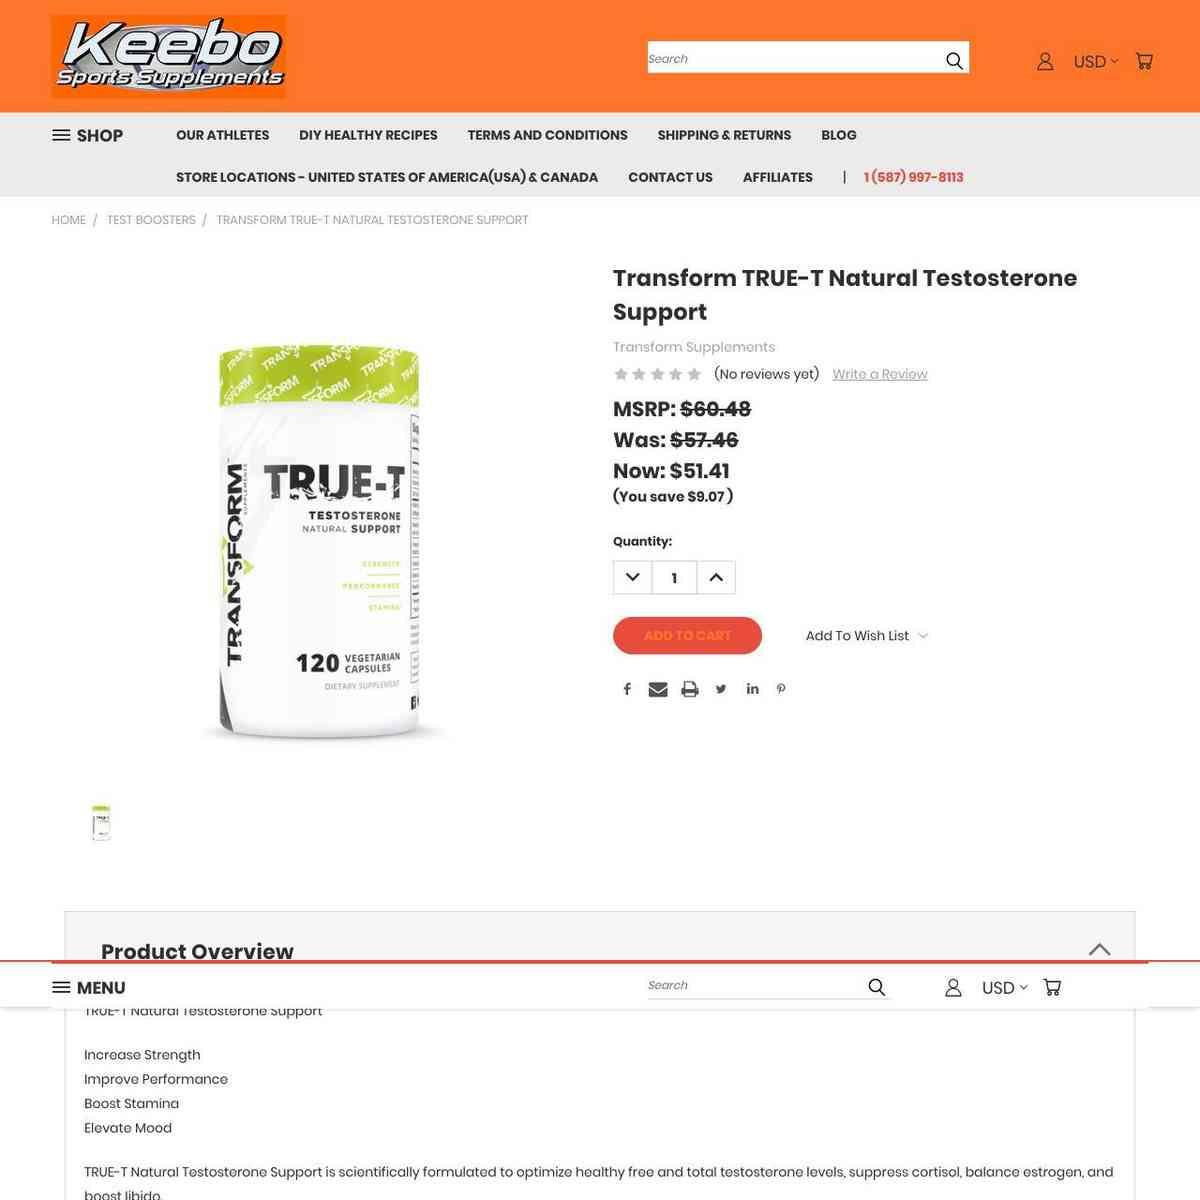 Transform TRUE-T Natural Testosterone Support